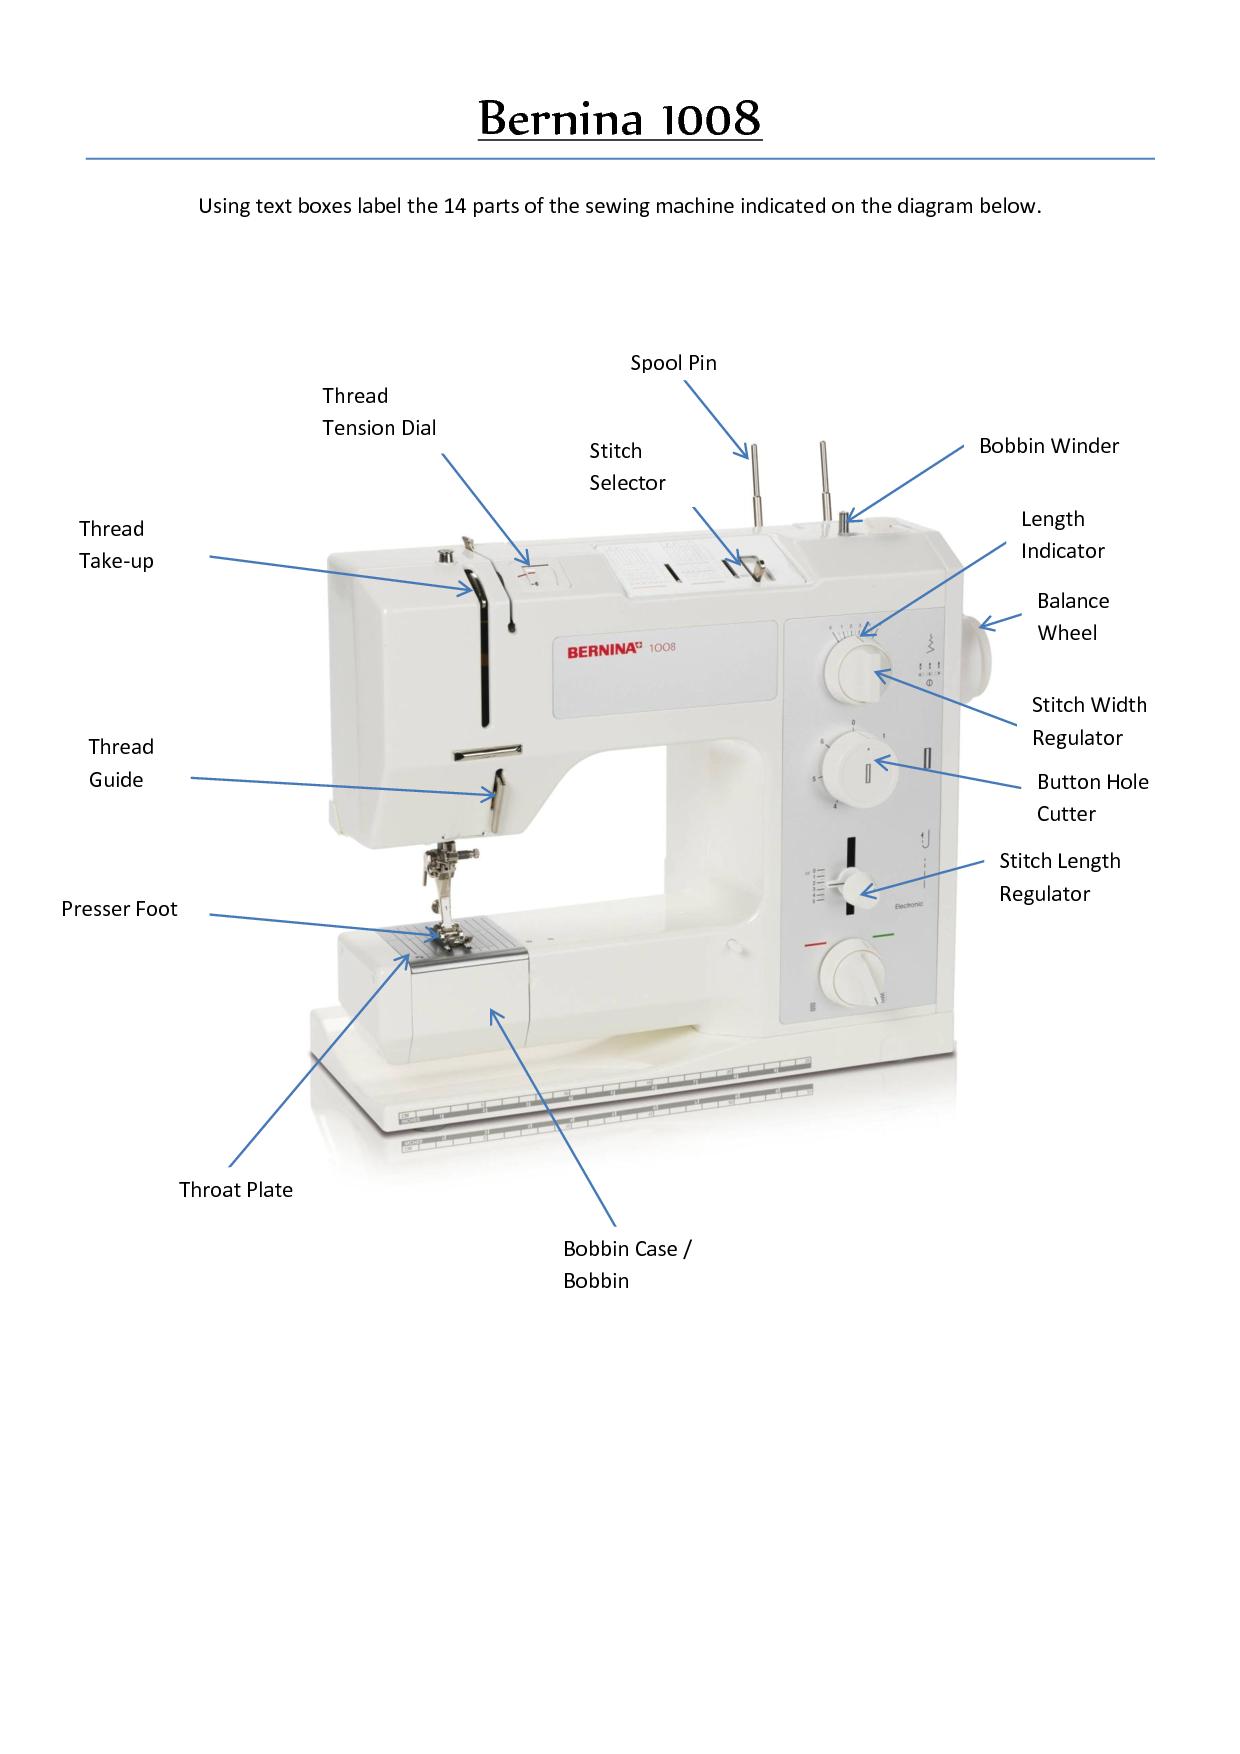 Sewing Machine Parts Diagram Worksheet Wiring For Warn 2500 Winch Bernina 1008 Costume Shop Pinterest